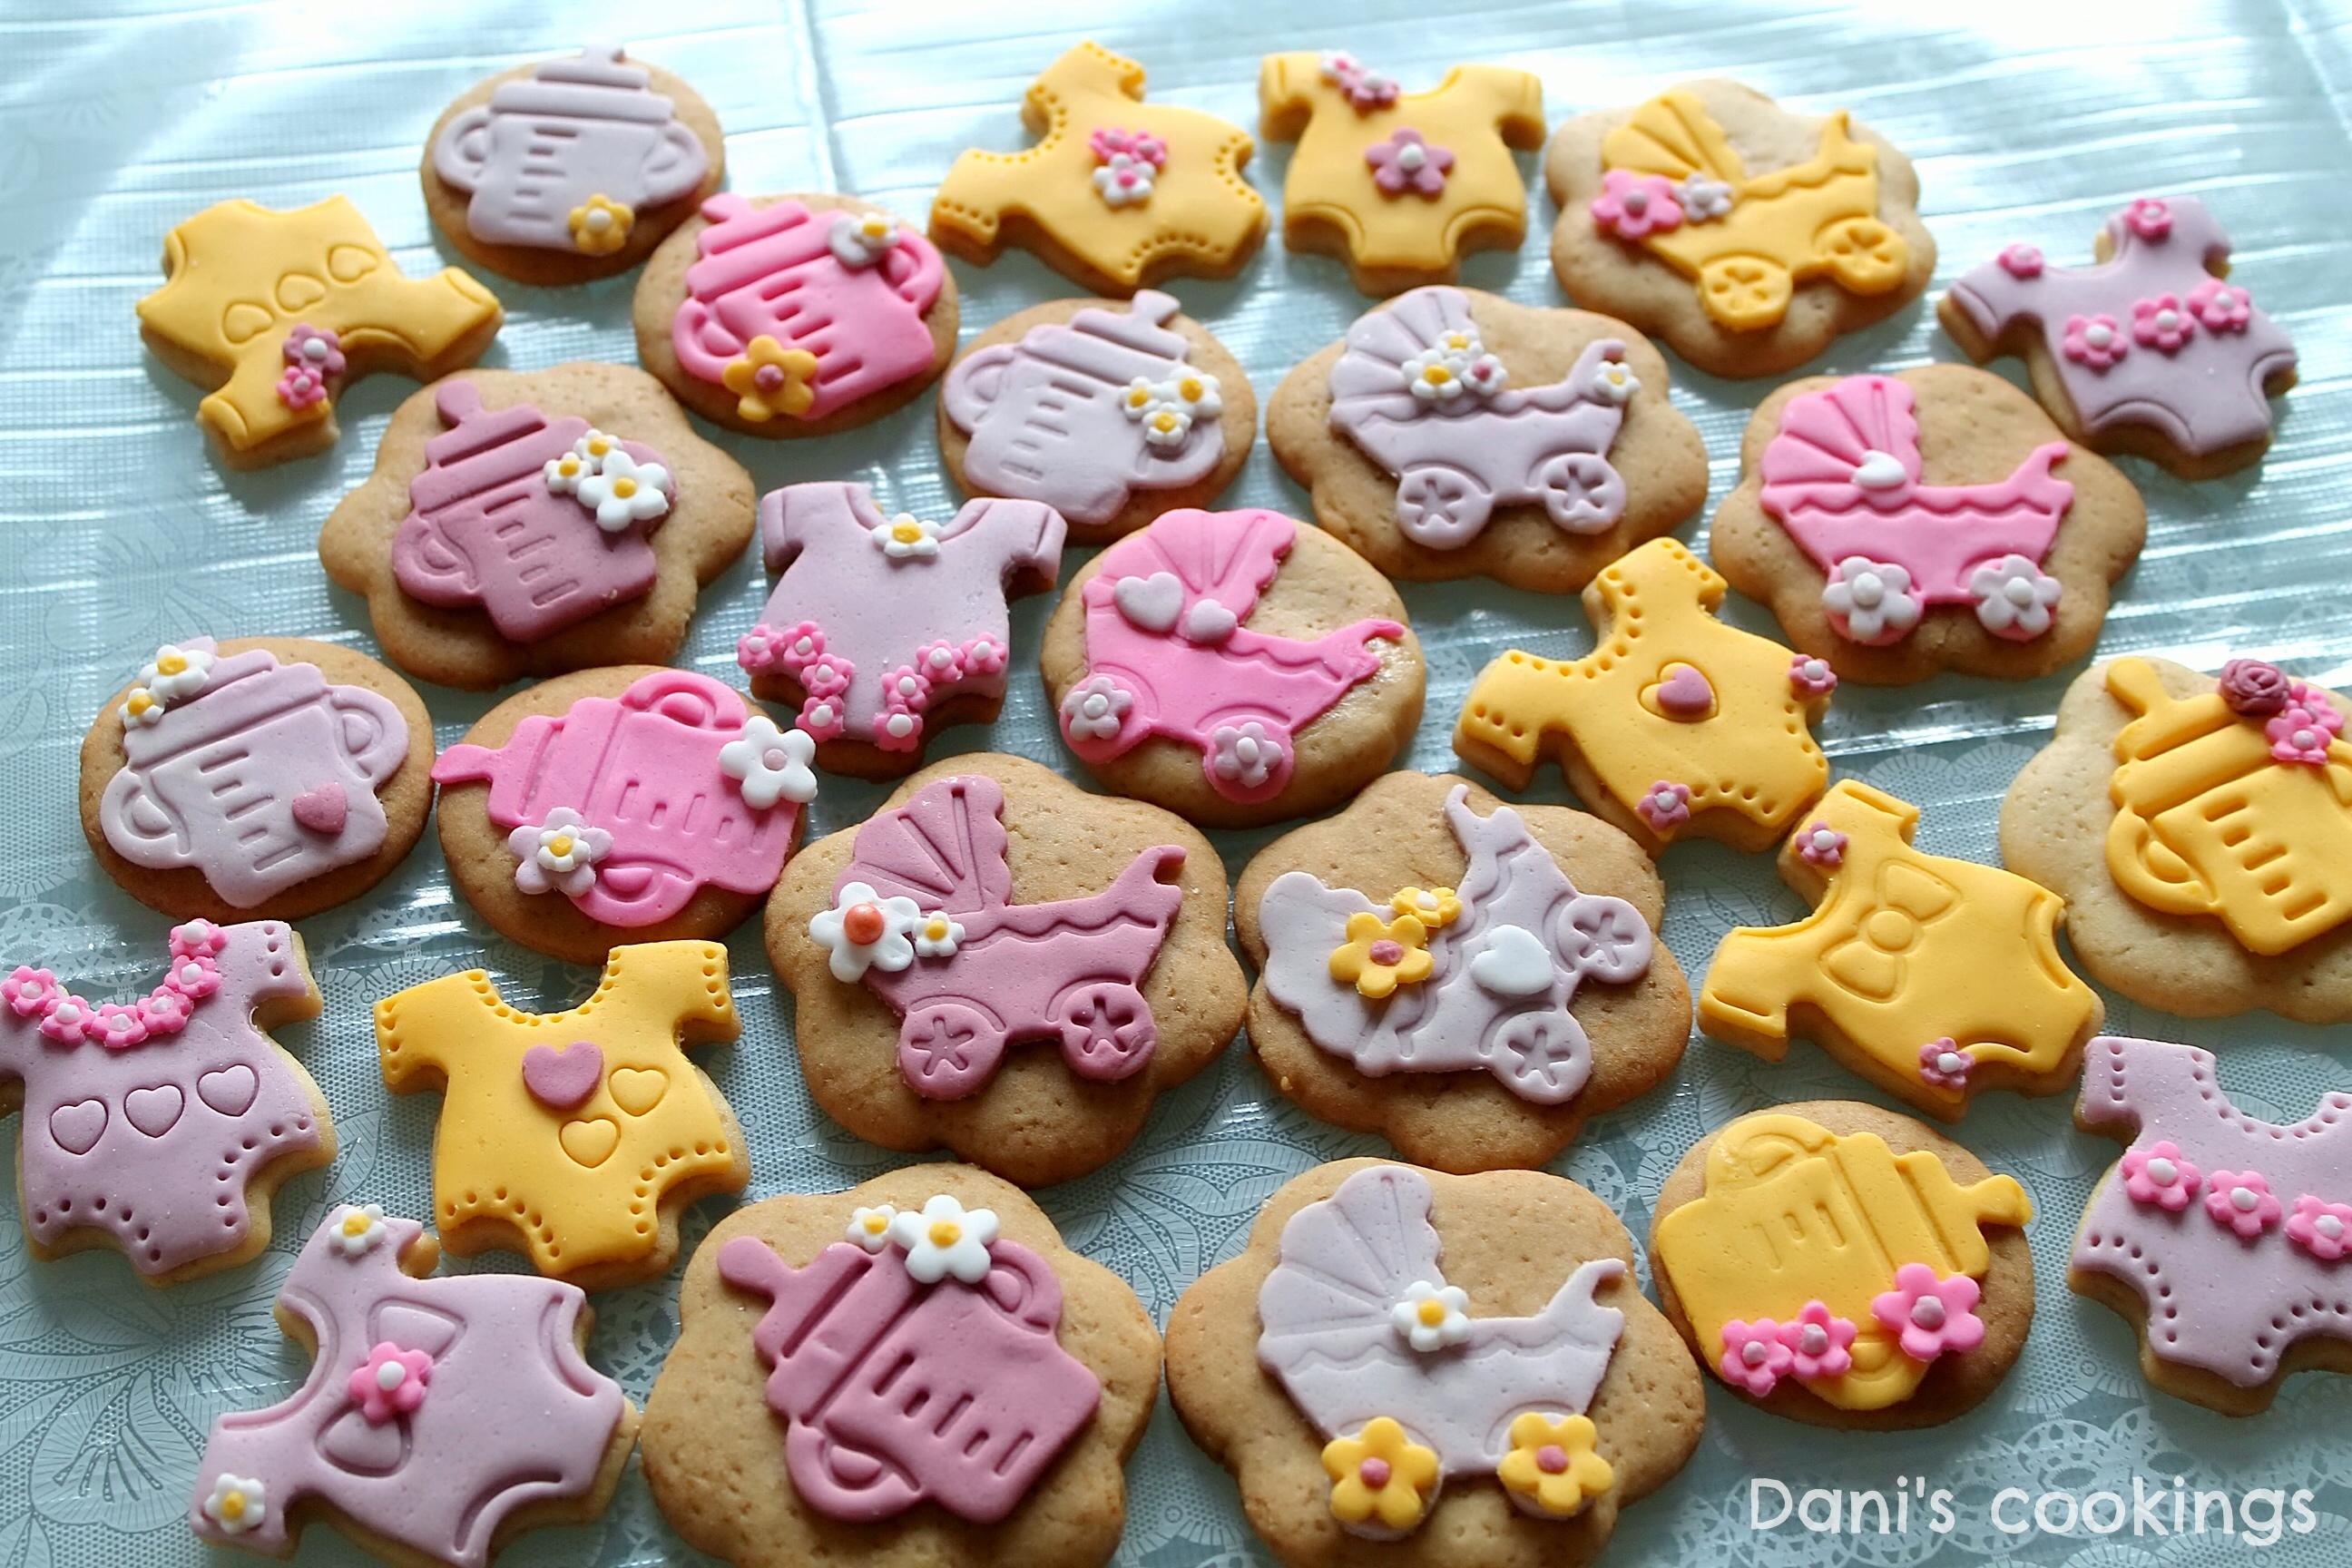 Baby Cake Amp Cookies Dani S Cookings